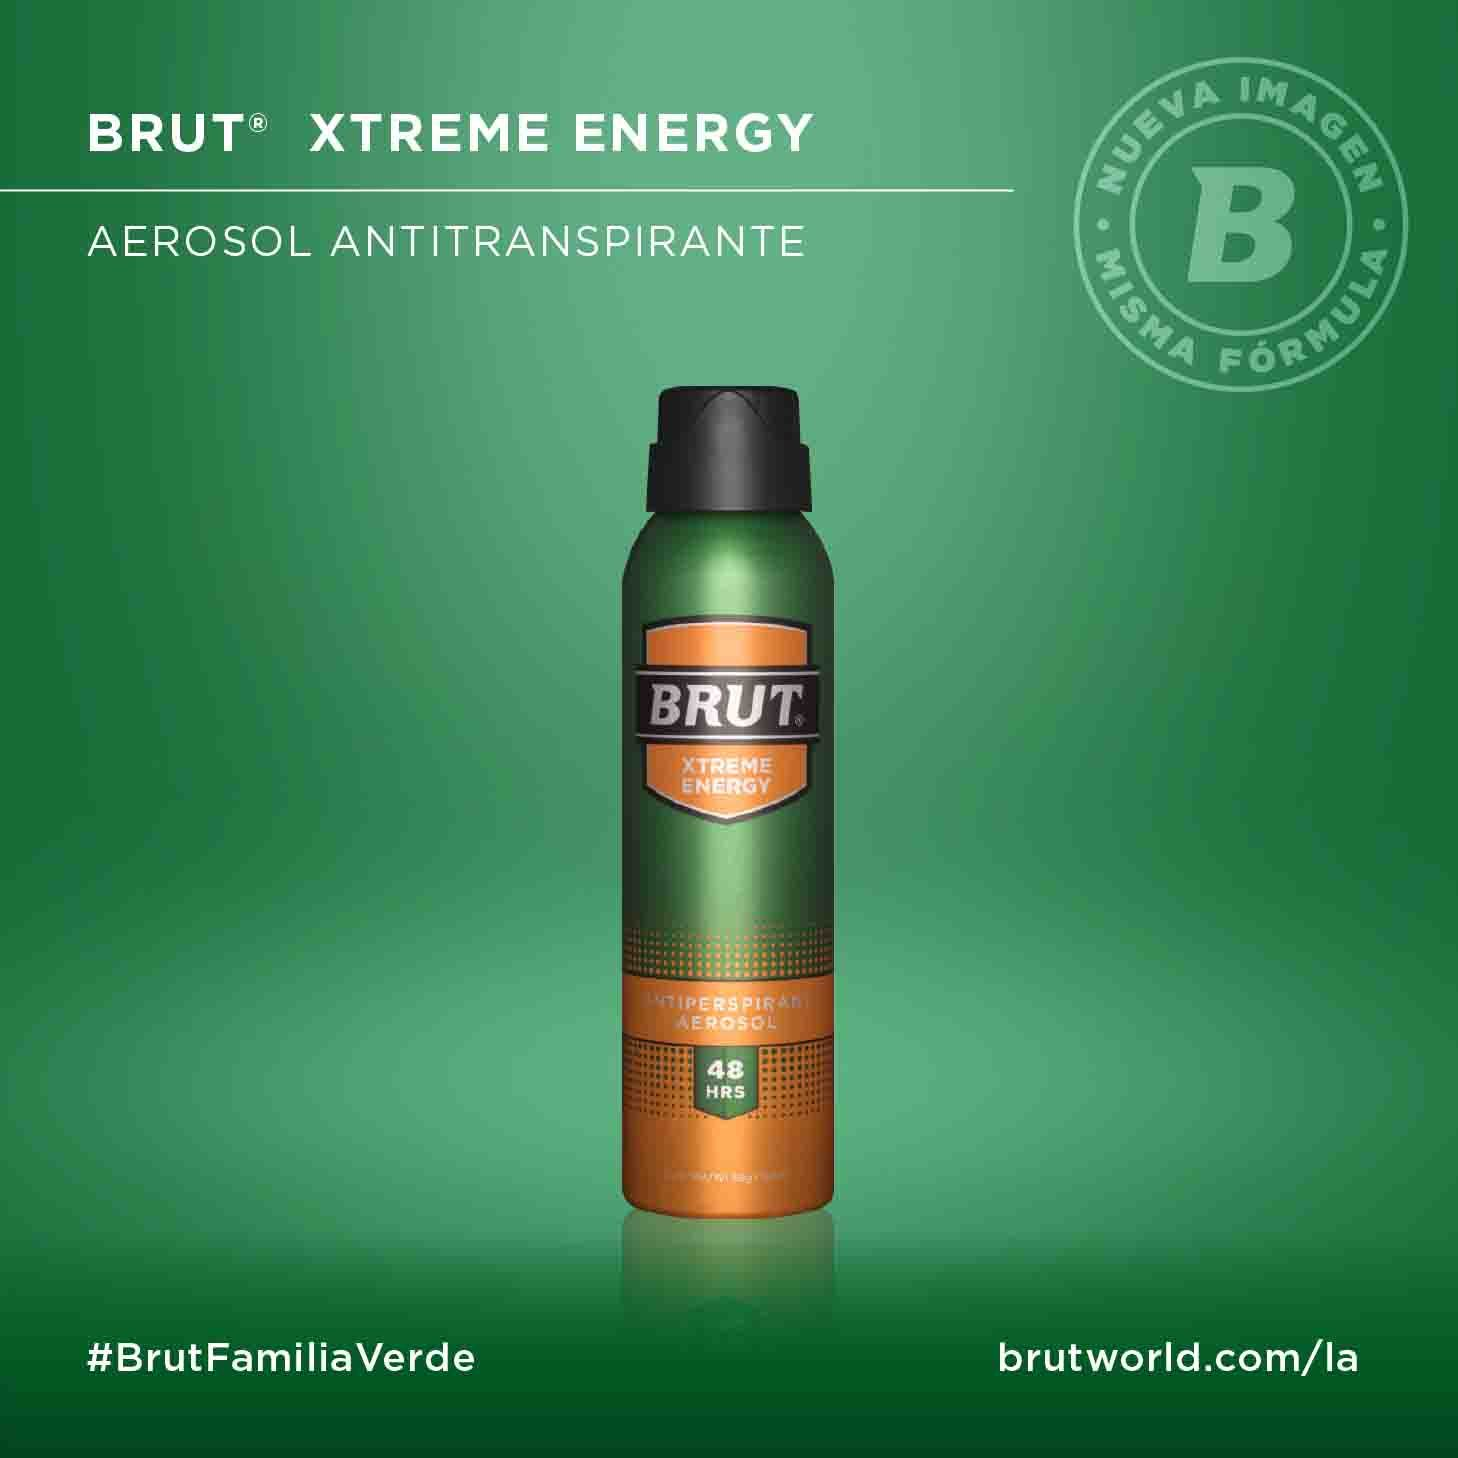 Fotografia Brut Xtrem Energy